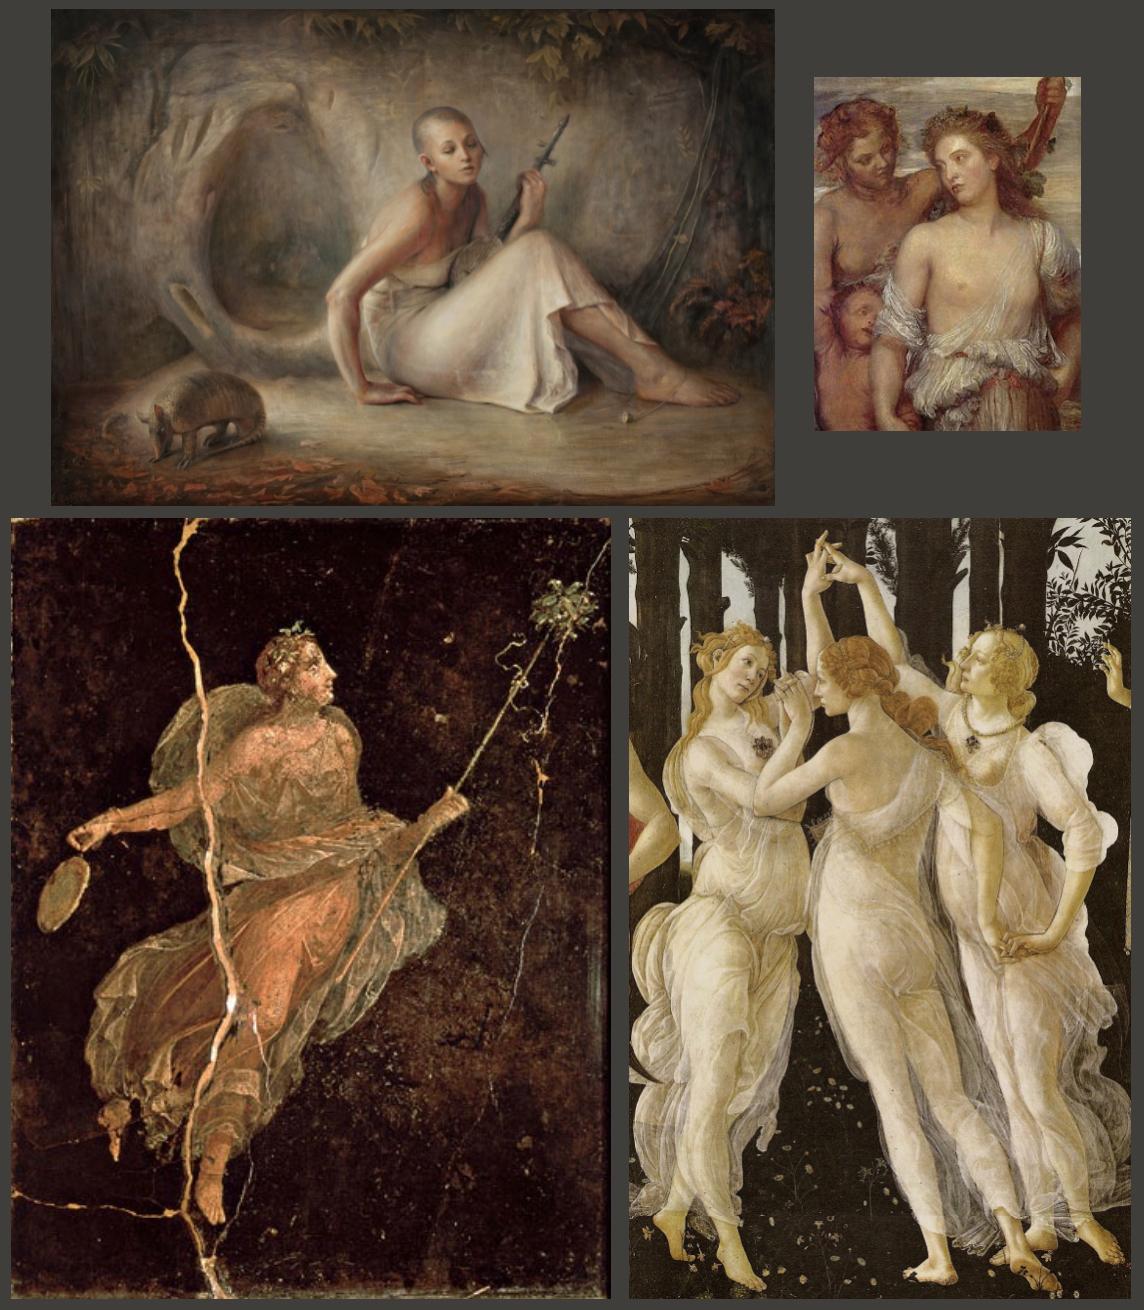 Luke Hillestad,  George Frederick Watts, Roman Fresco,Sandro Botticelli